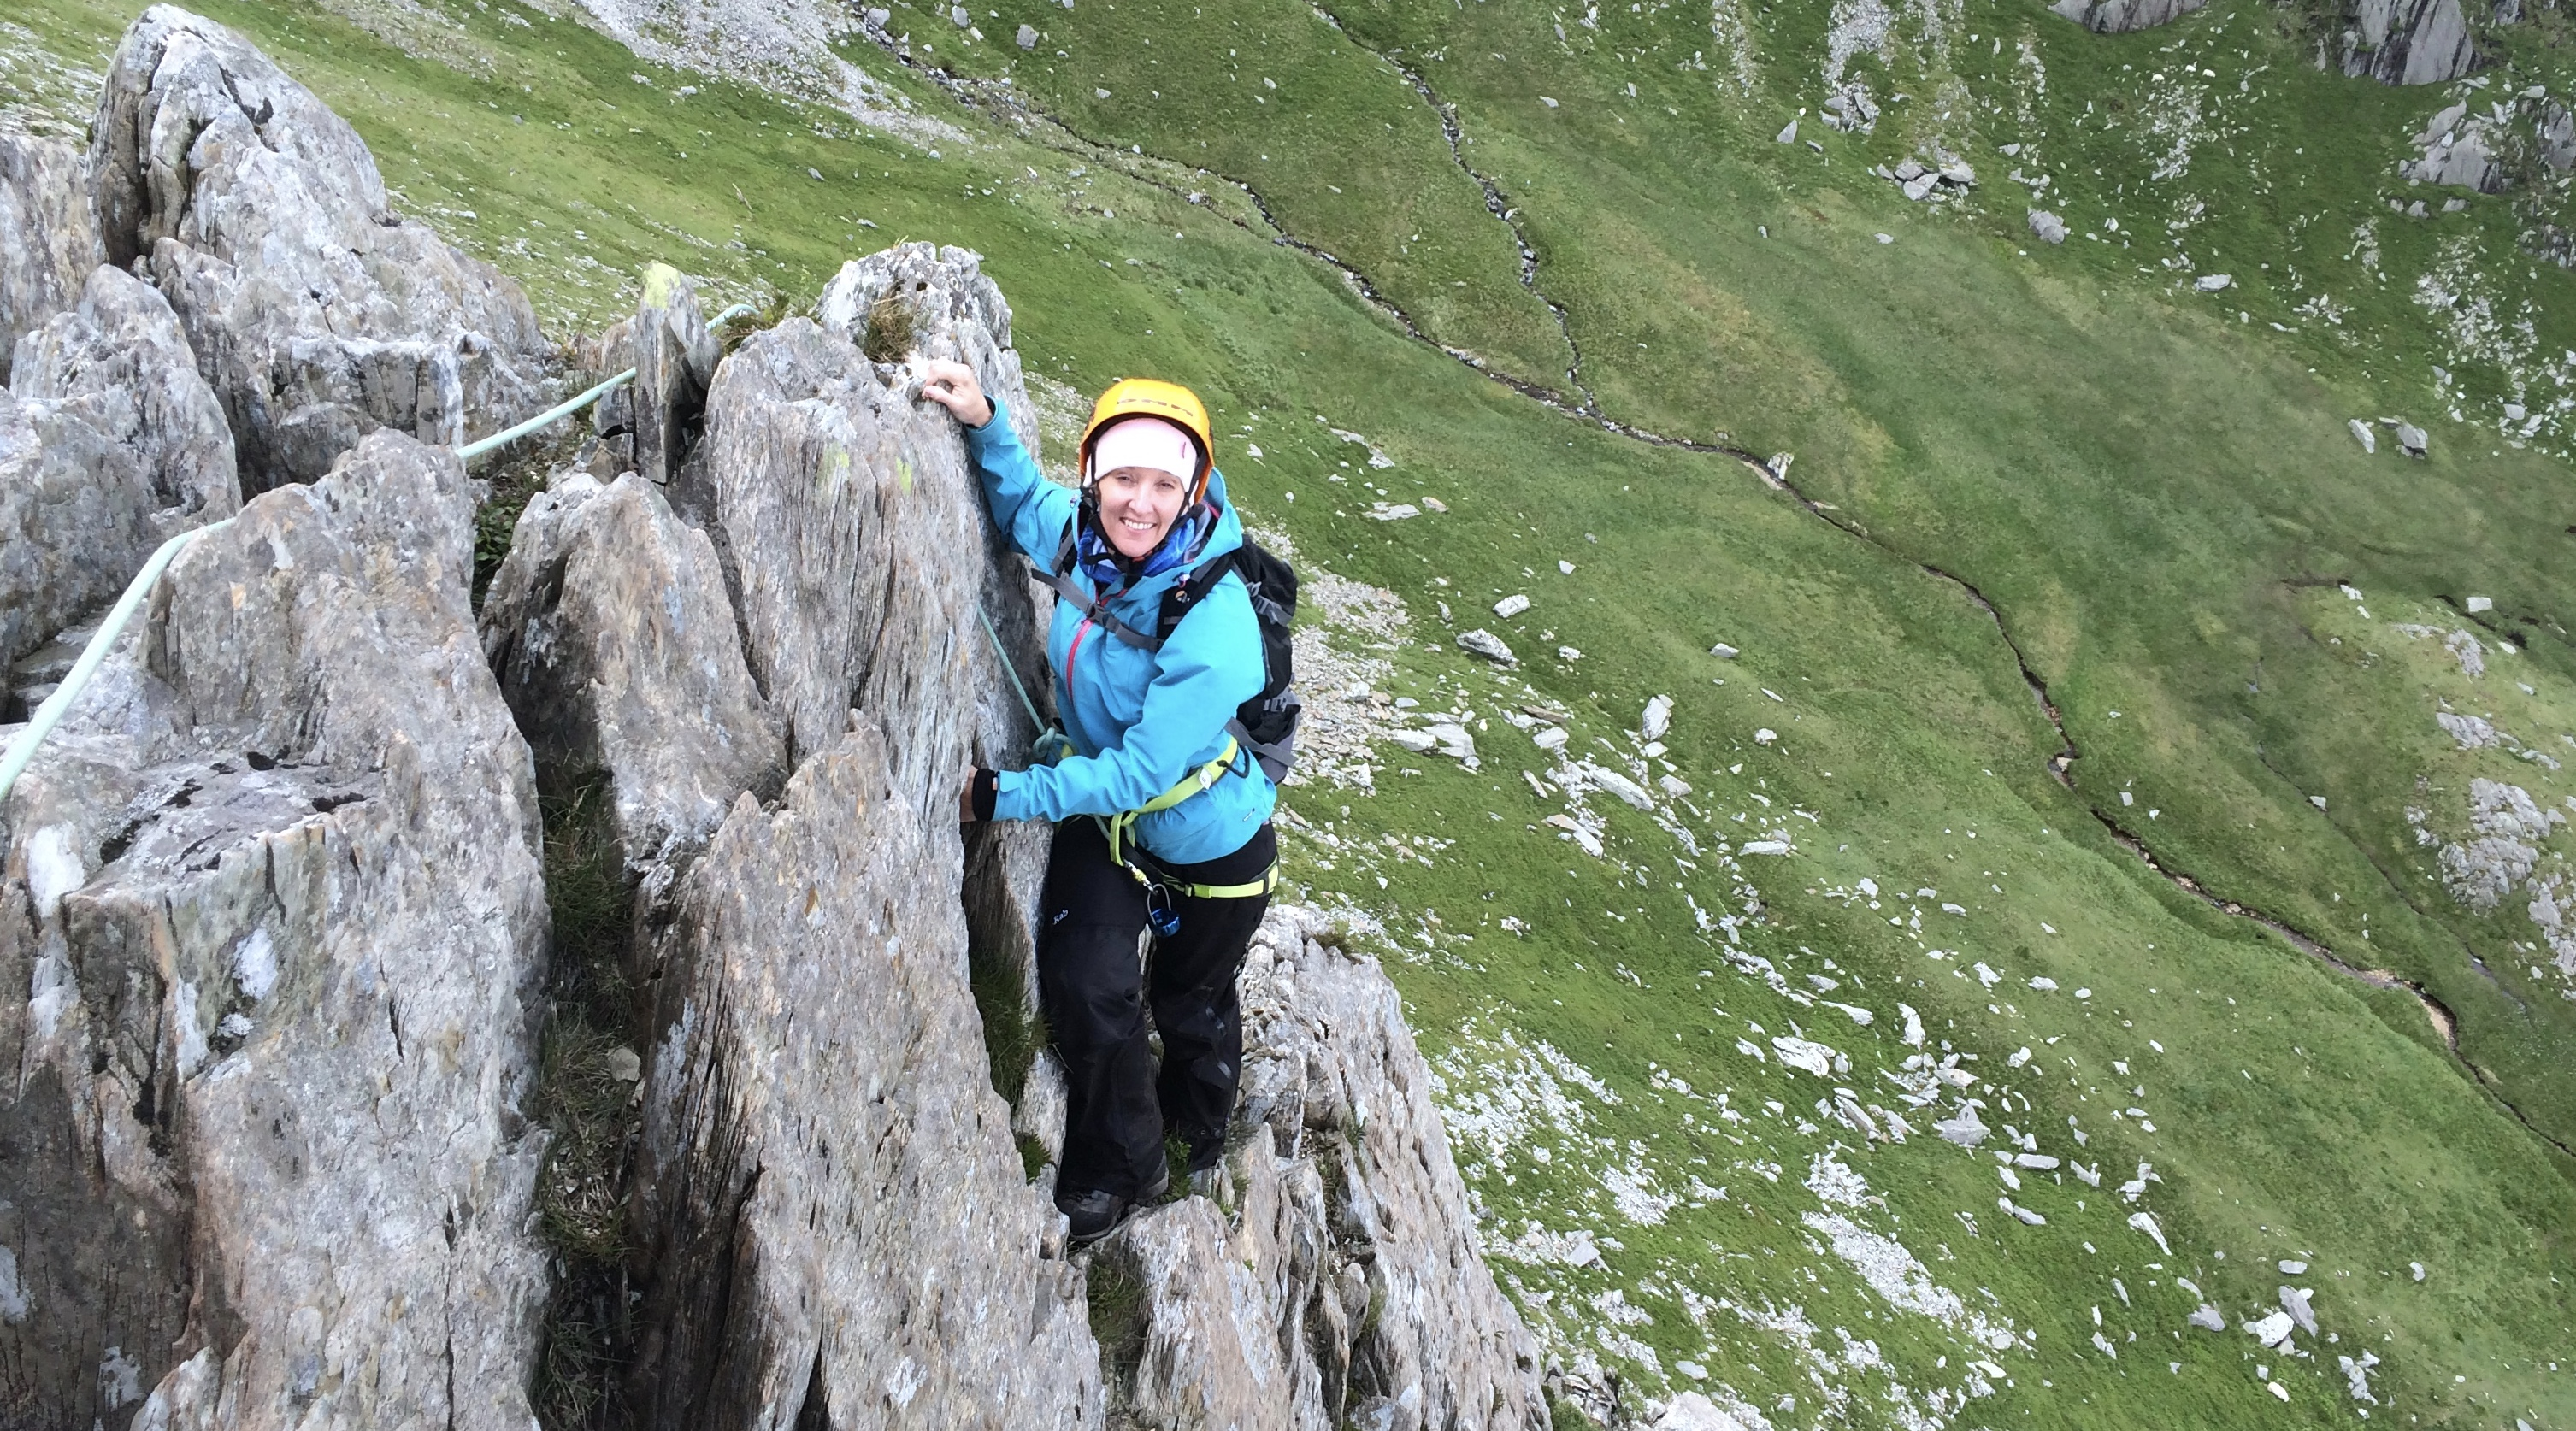 Female scrambler on a rocky ridge in North Wales